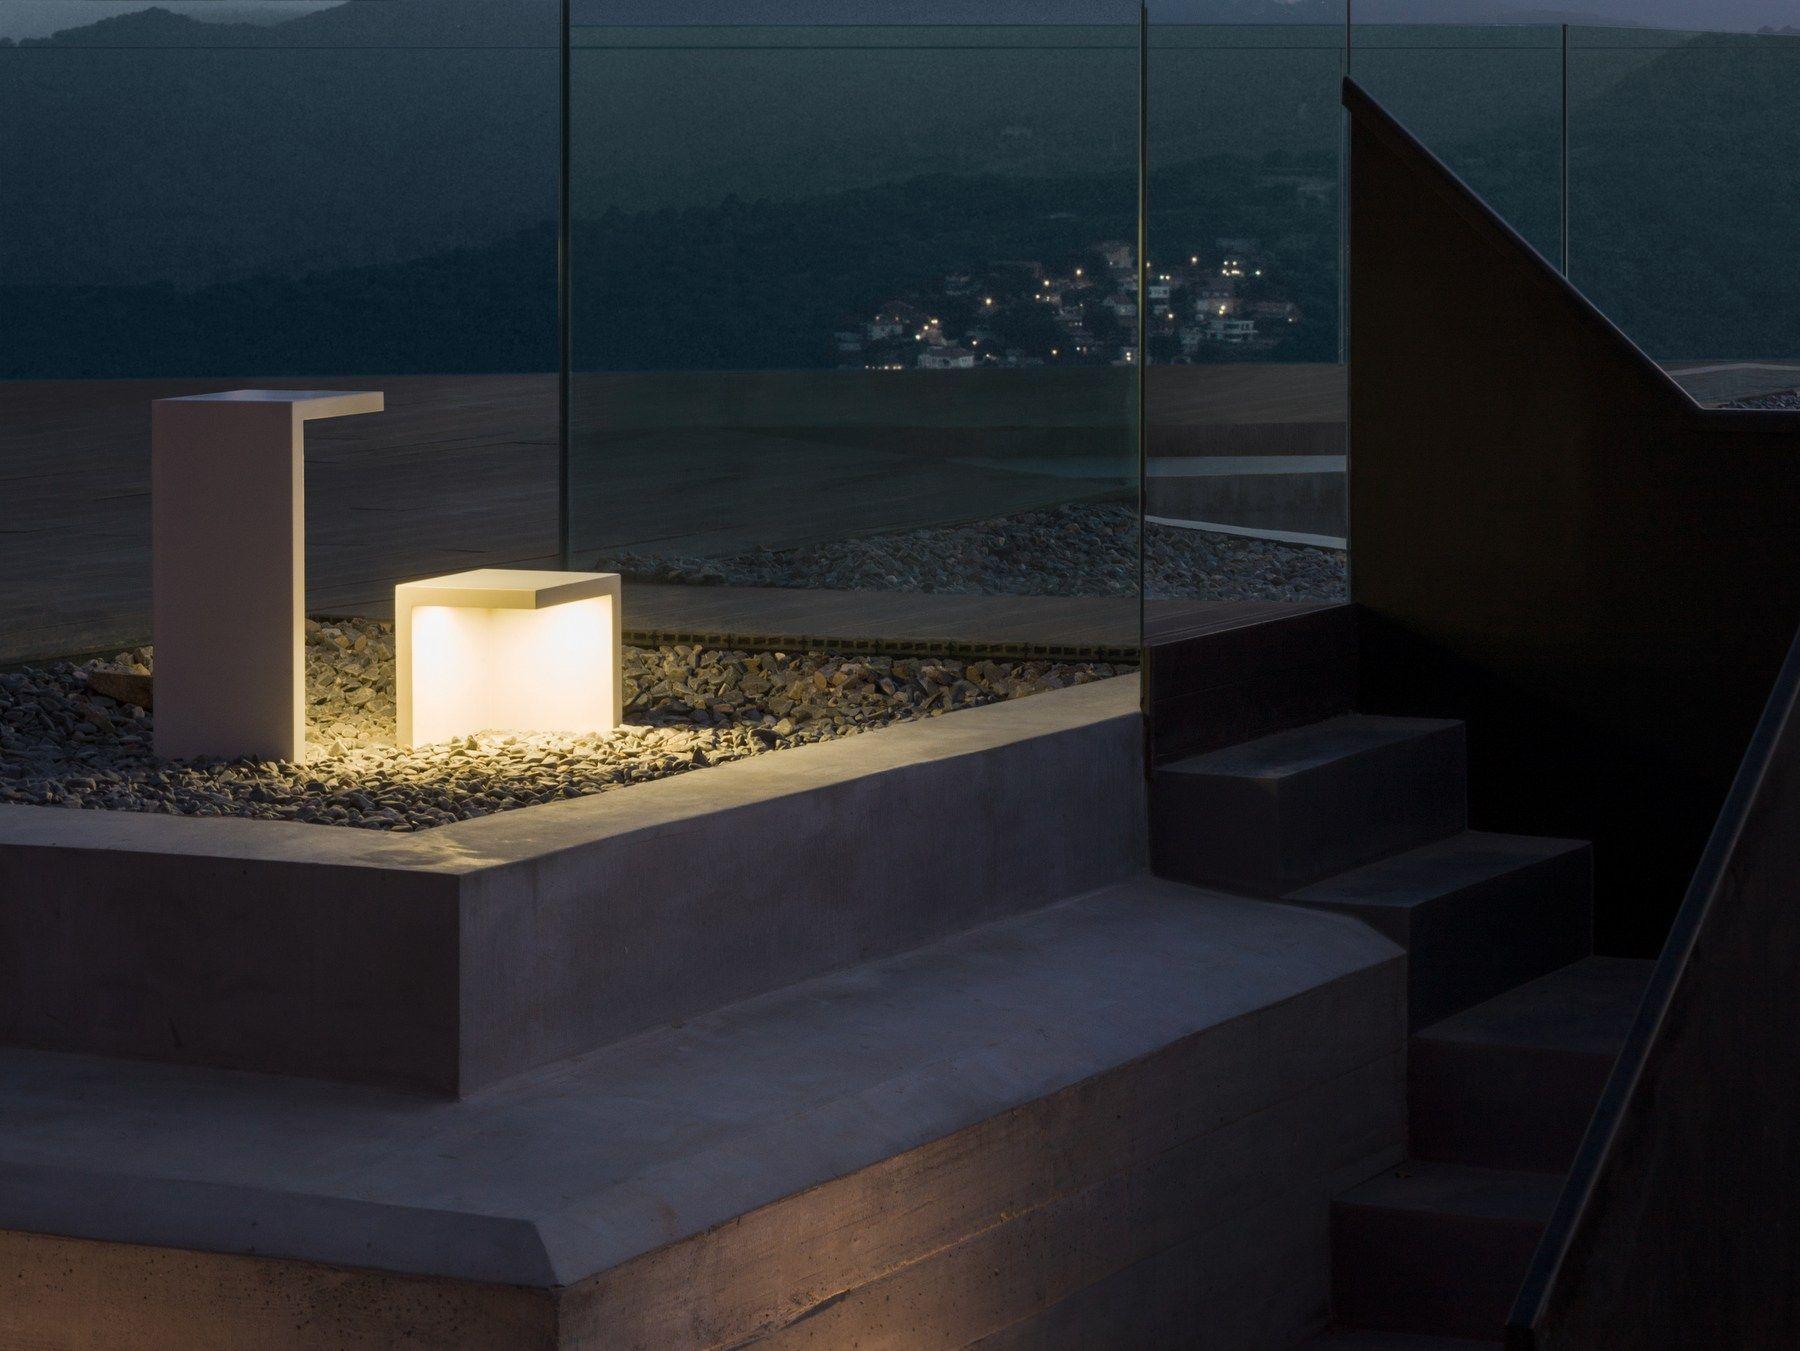 Led cement floor lamp empty by vibia design josep llu s - Iluminacion exterior led ...